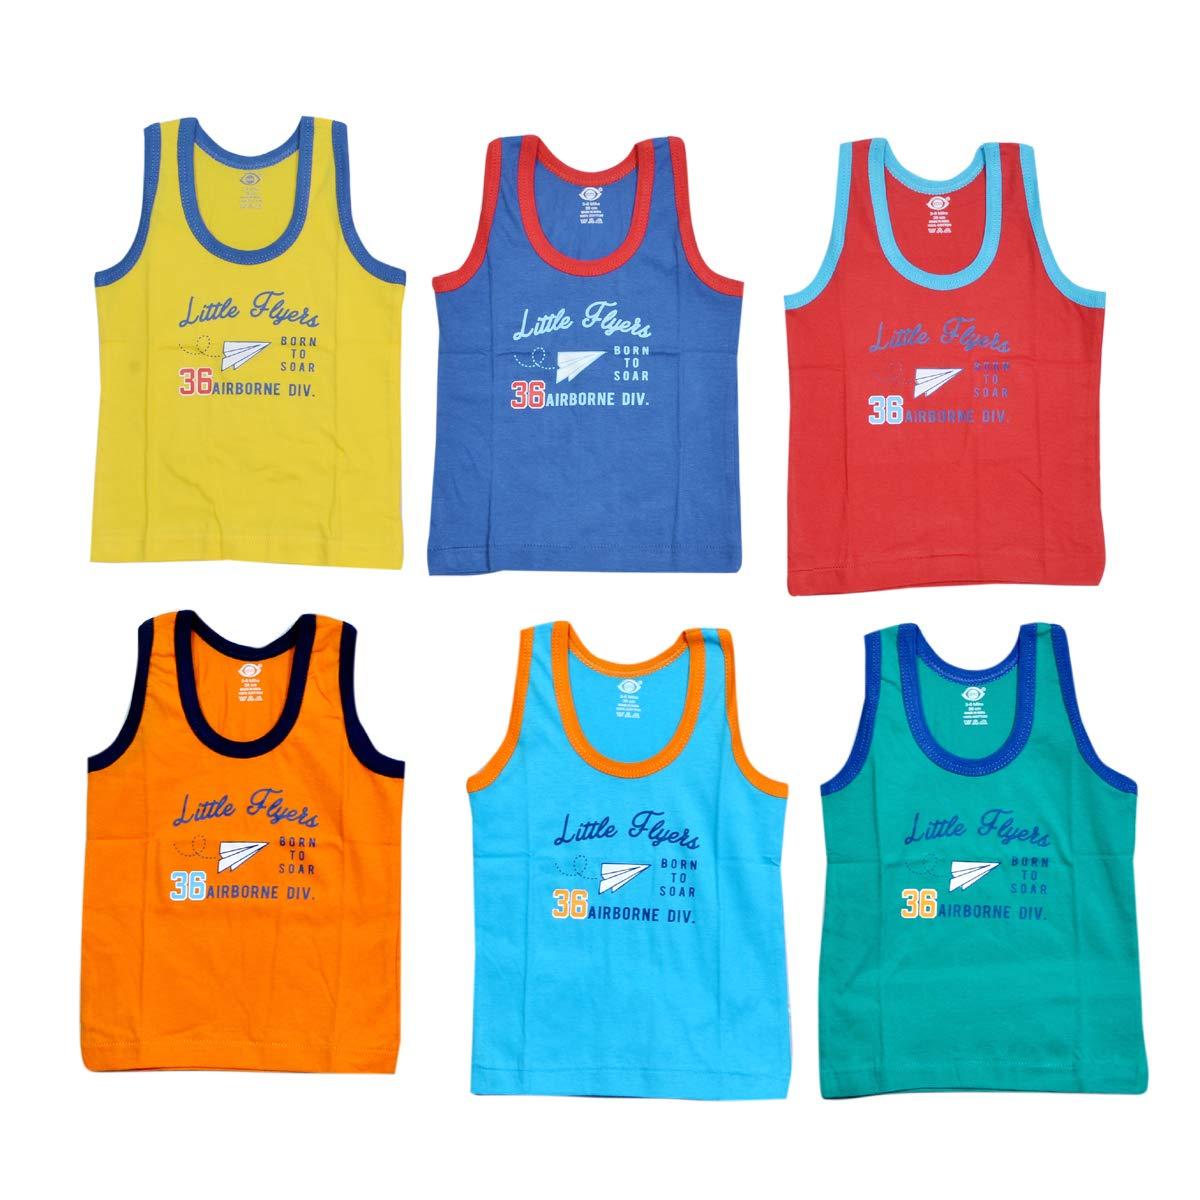 42d54bca46 GURU KRIPA BABY PRODUCTS ® Products Presents Born Baby Kids Inner Wear  Baniyan Unisex Printed Cotton